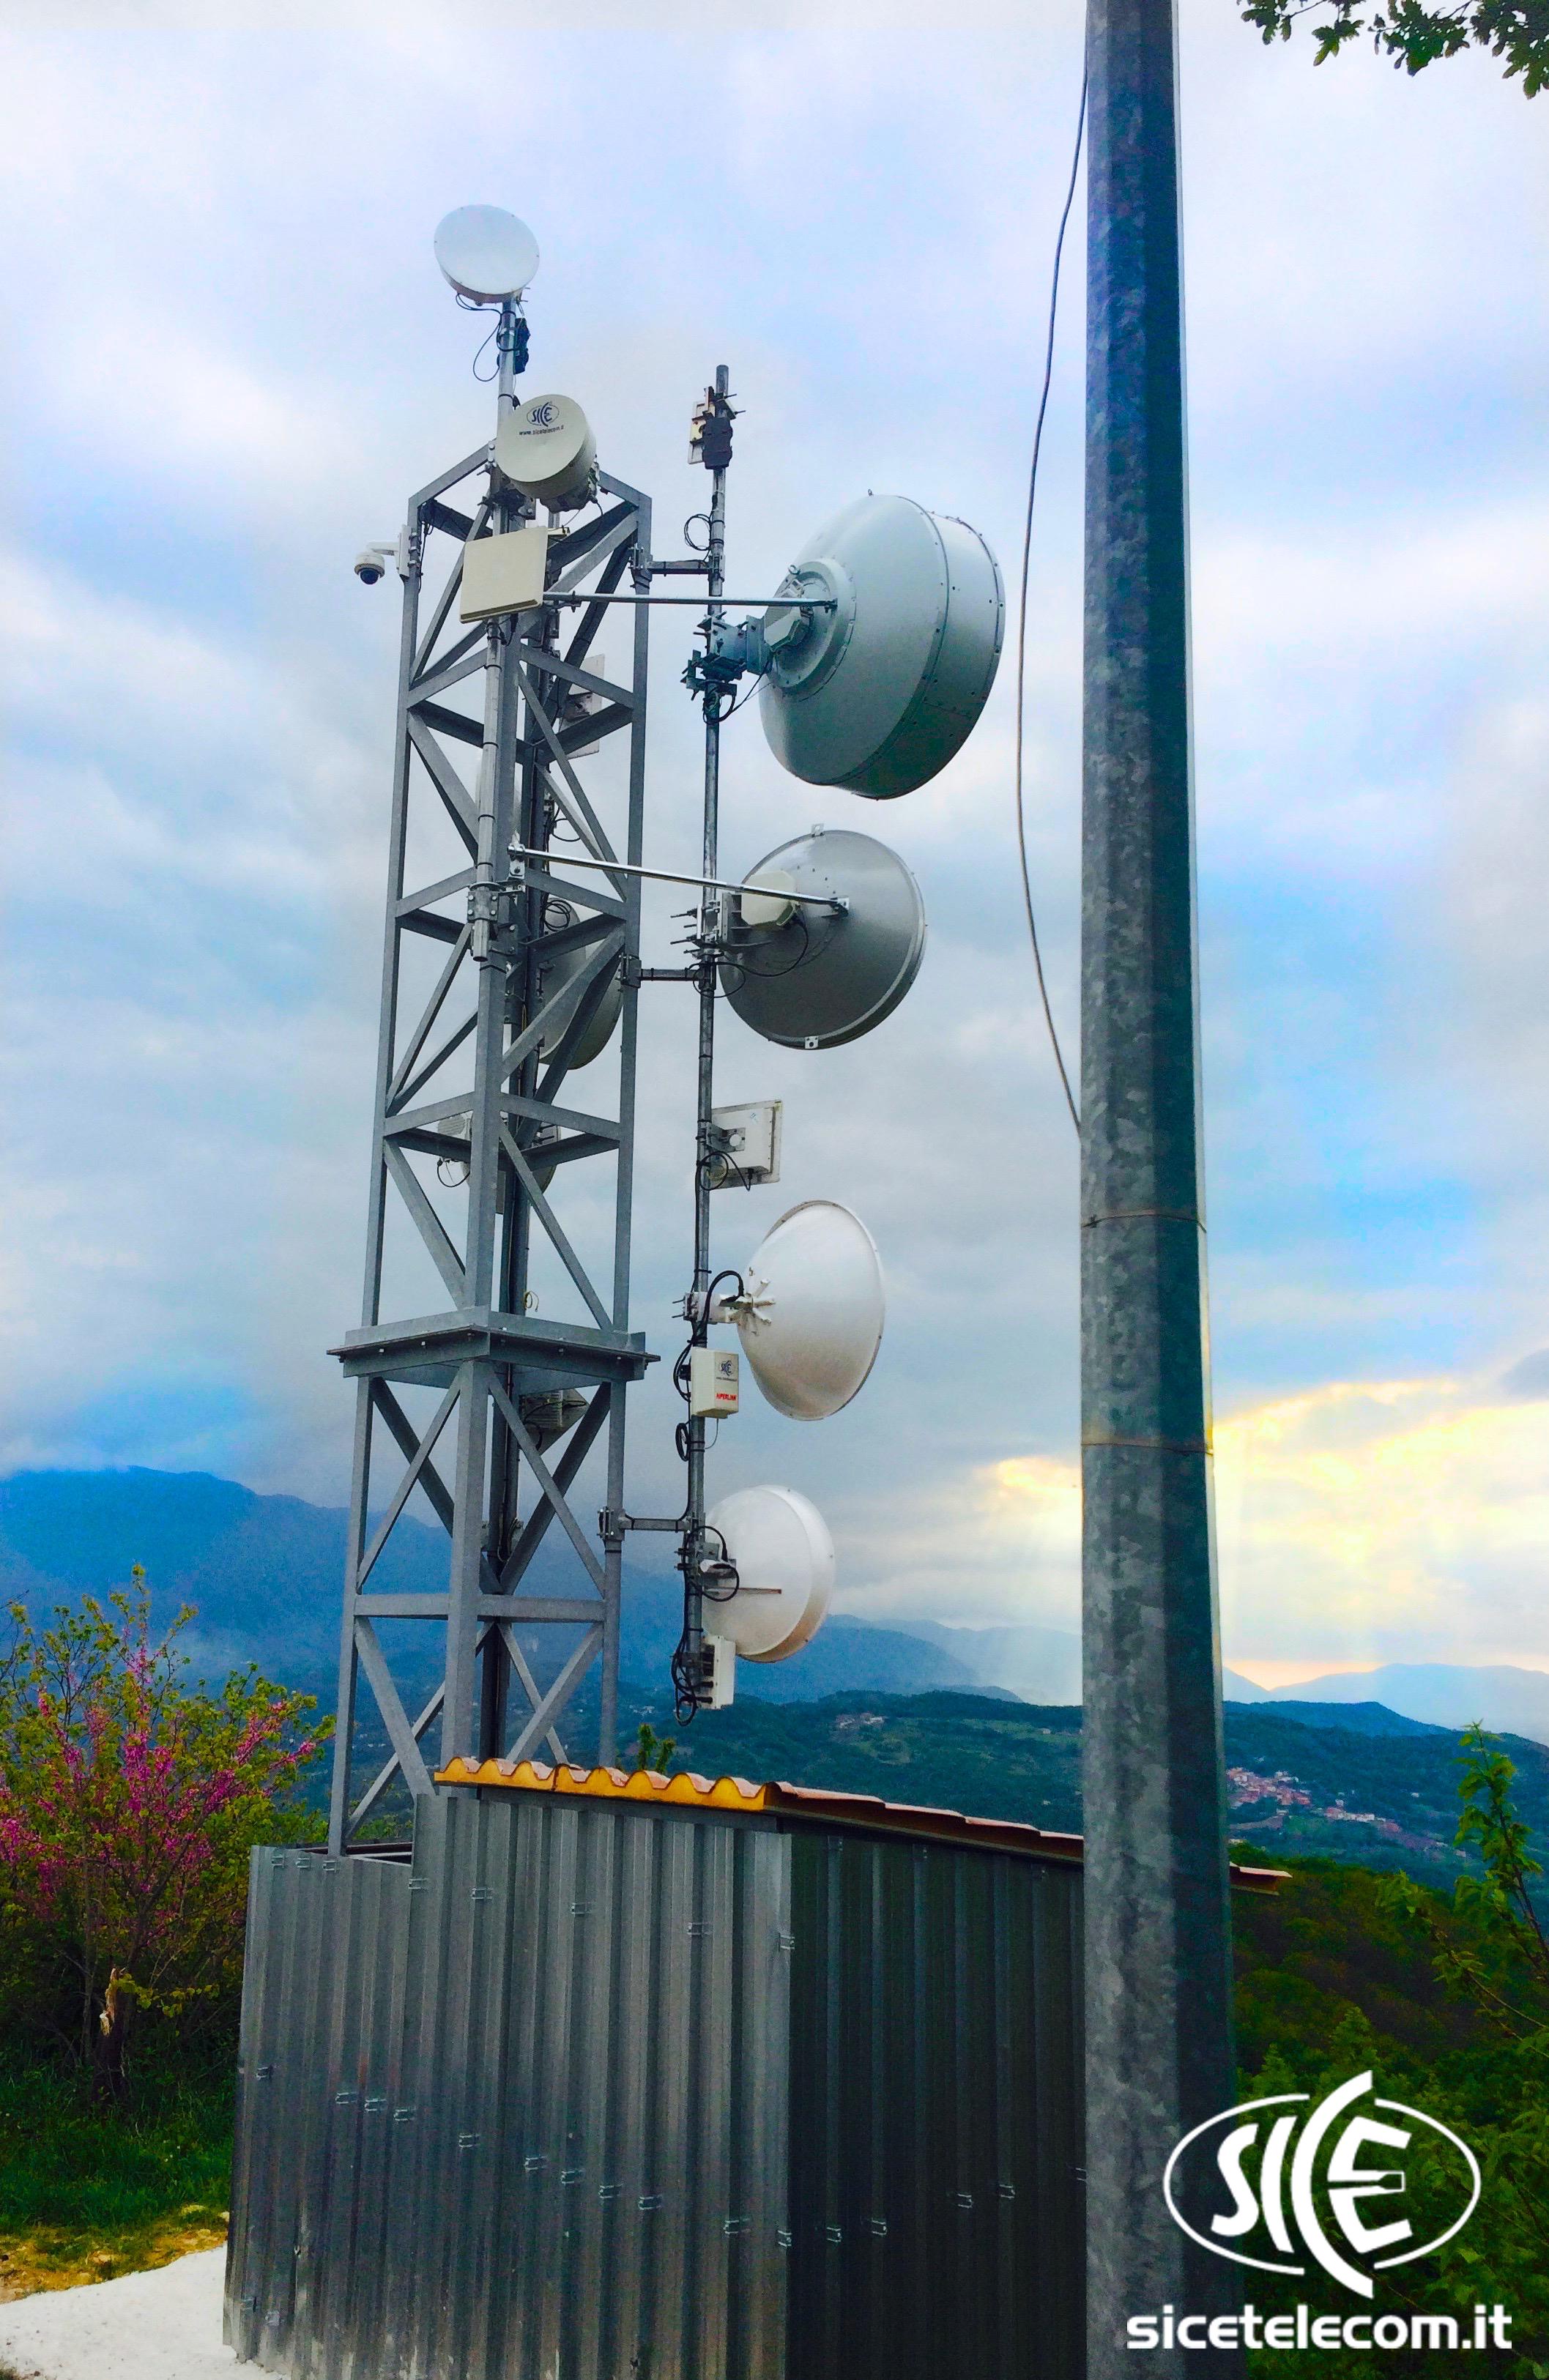 MULTINAZIONALE SAPA | Case studies Case Studies  consulsat consulservice ponti radio rete dati sice wifi wireless